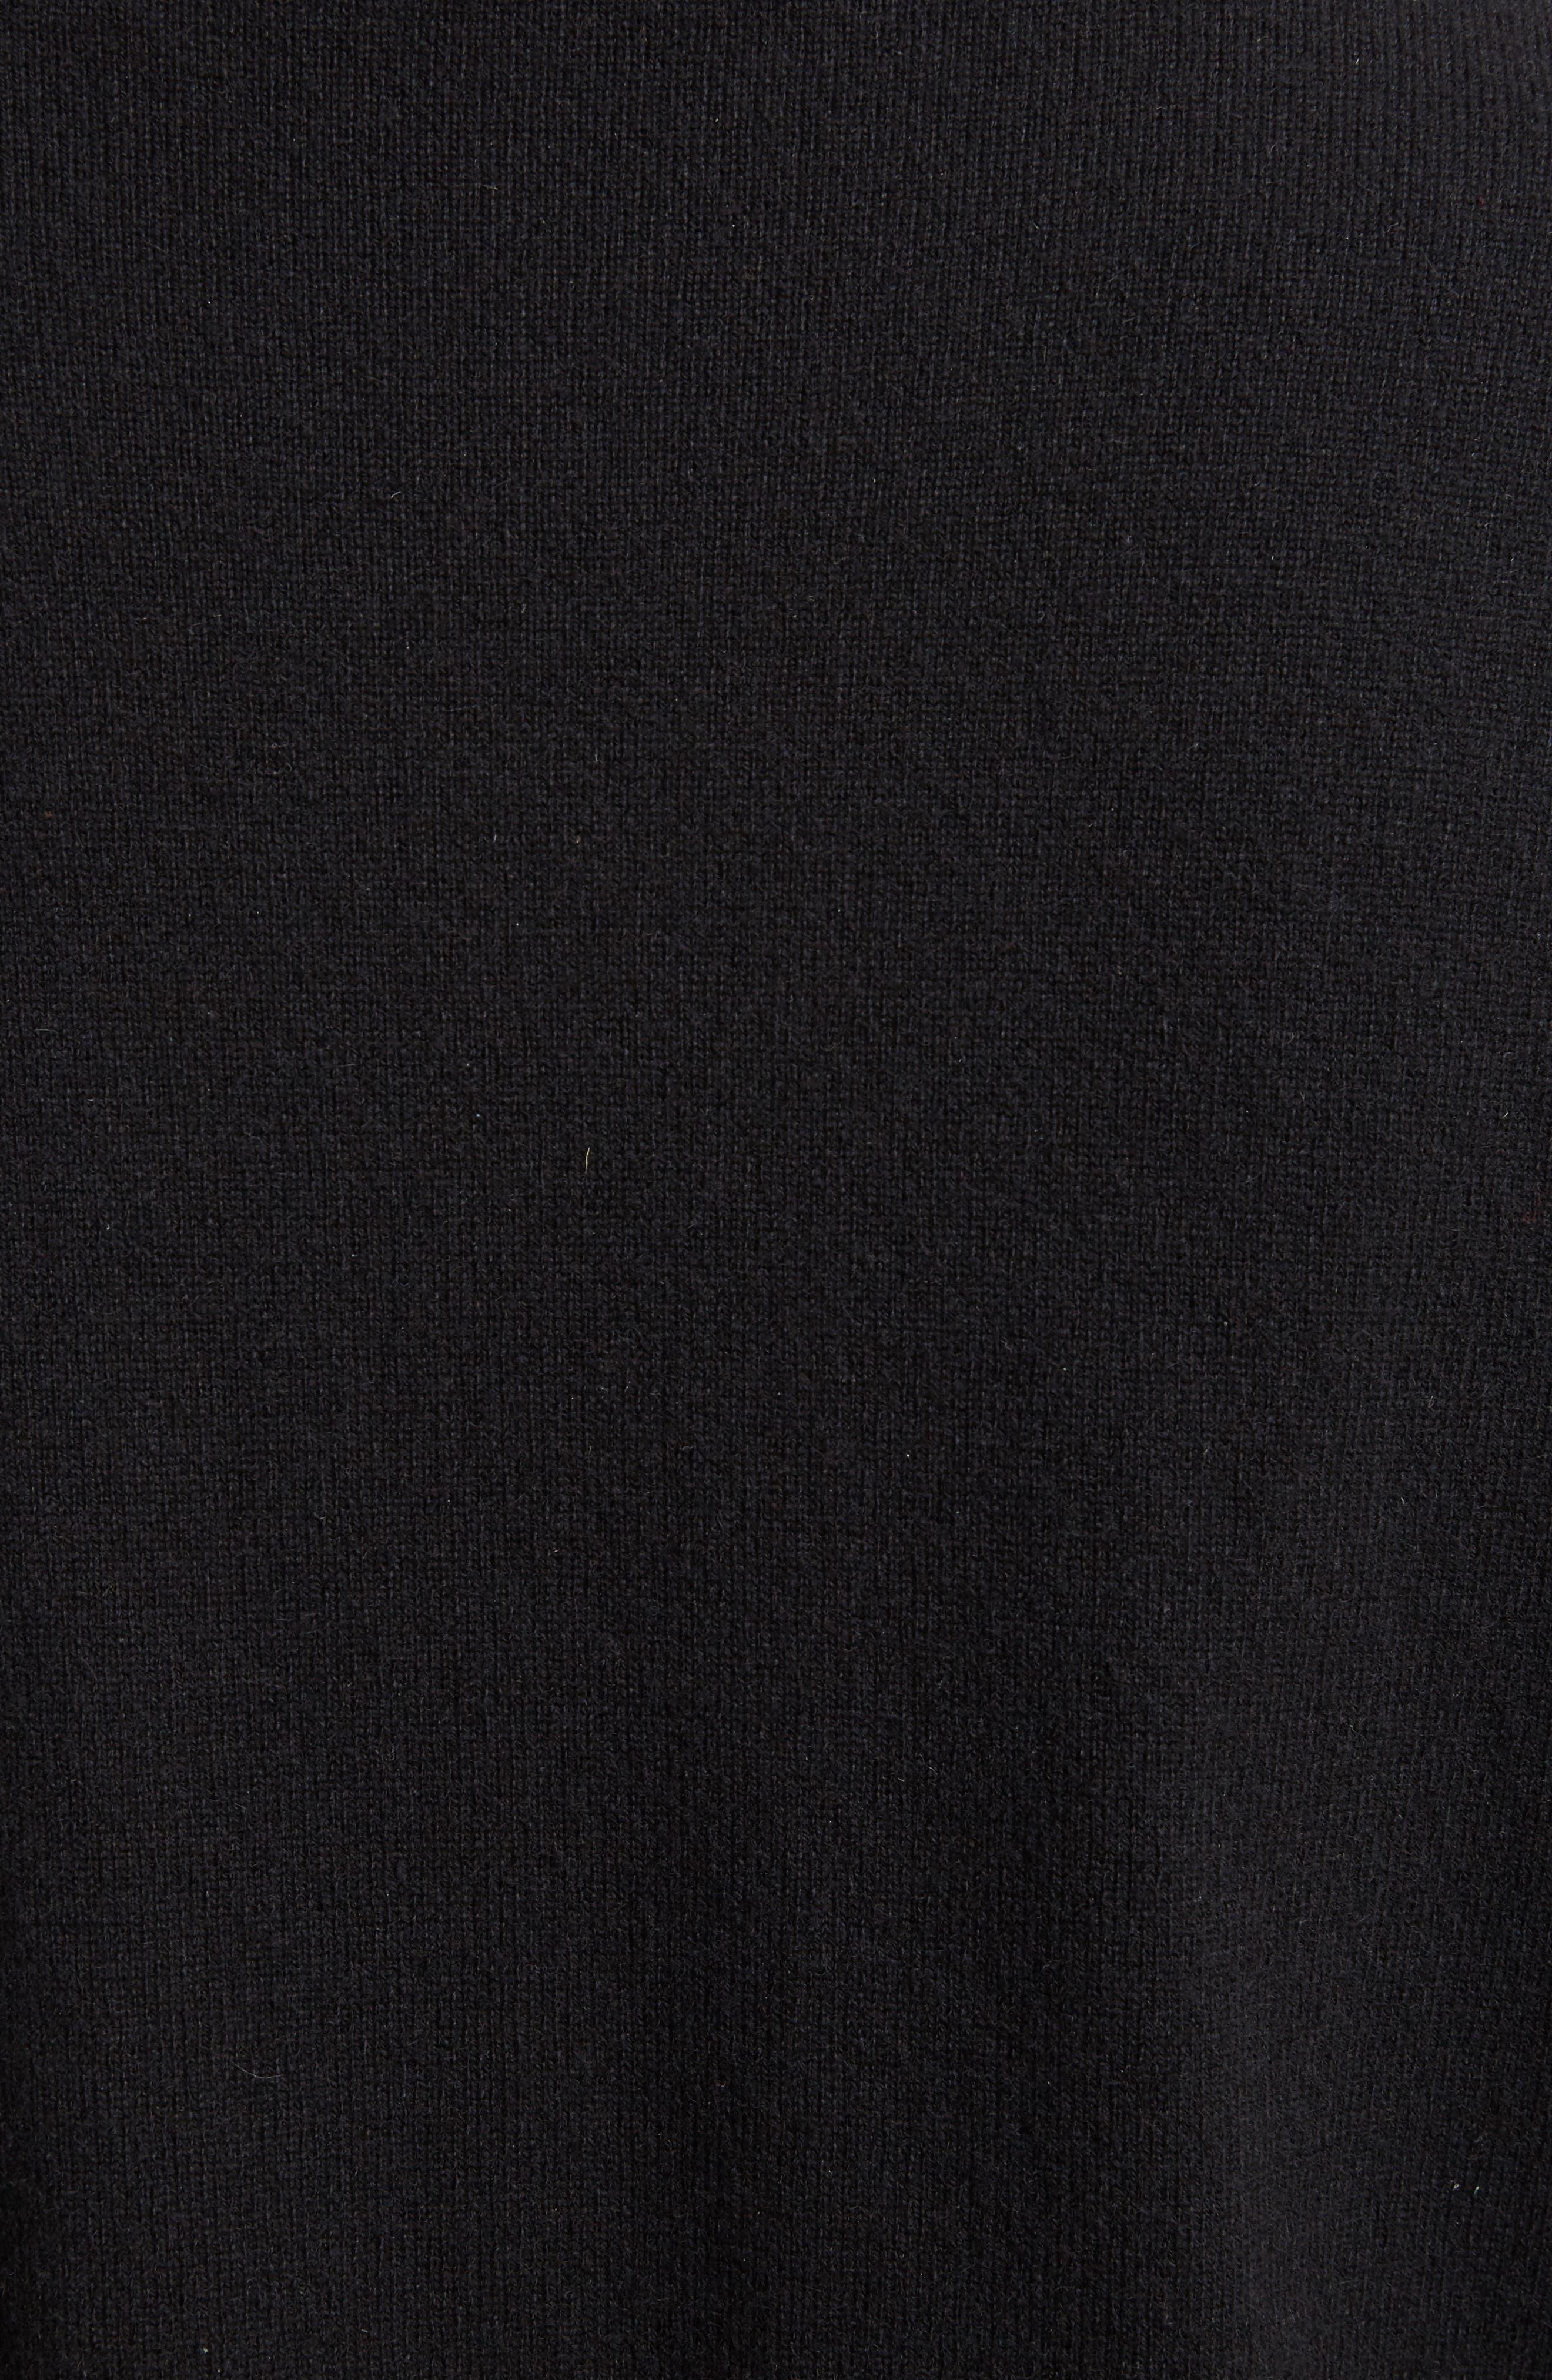 Alternate Image 3  - Dries Van Noten Silk Hem Cashmere Turtleneck Sweater